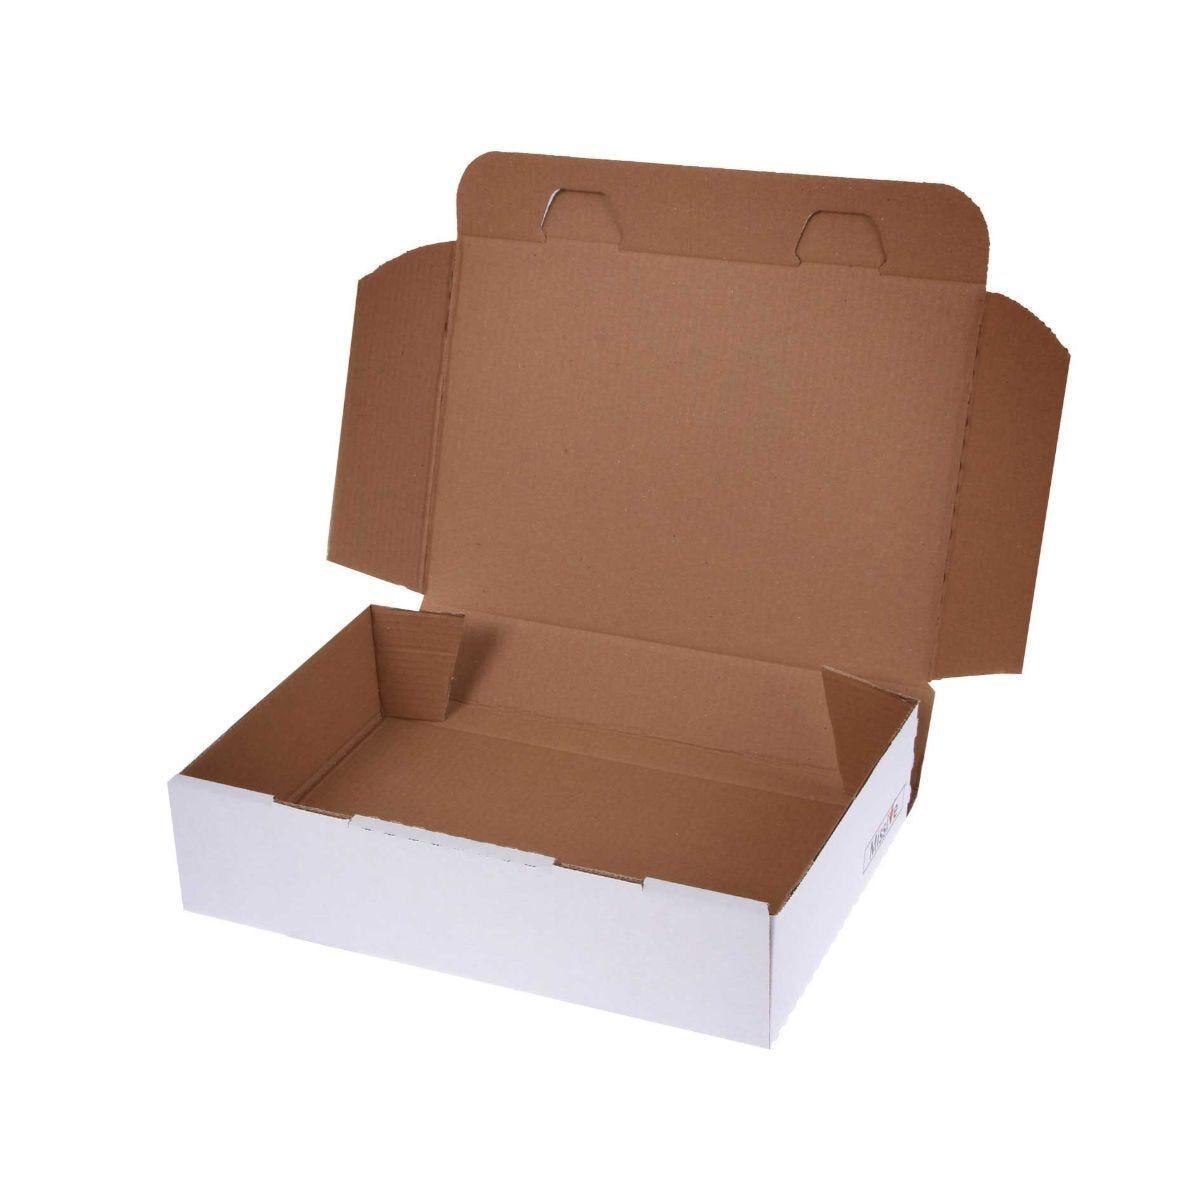 Missive Value Postal Box Half Small Parcel 318x222x80mm Pack of 20